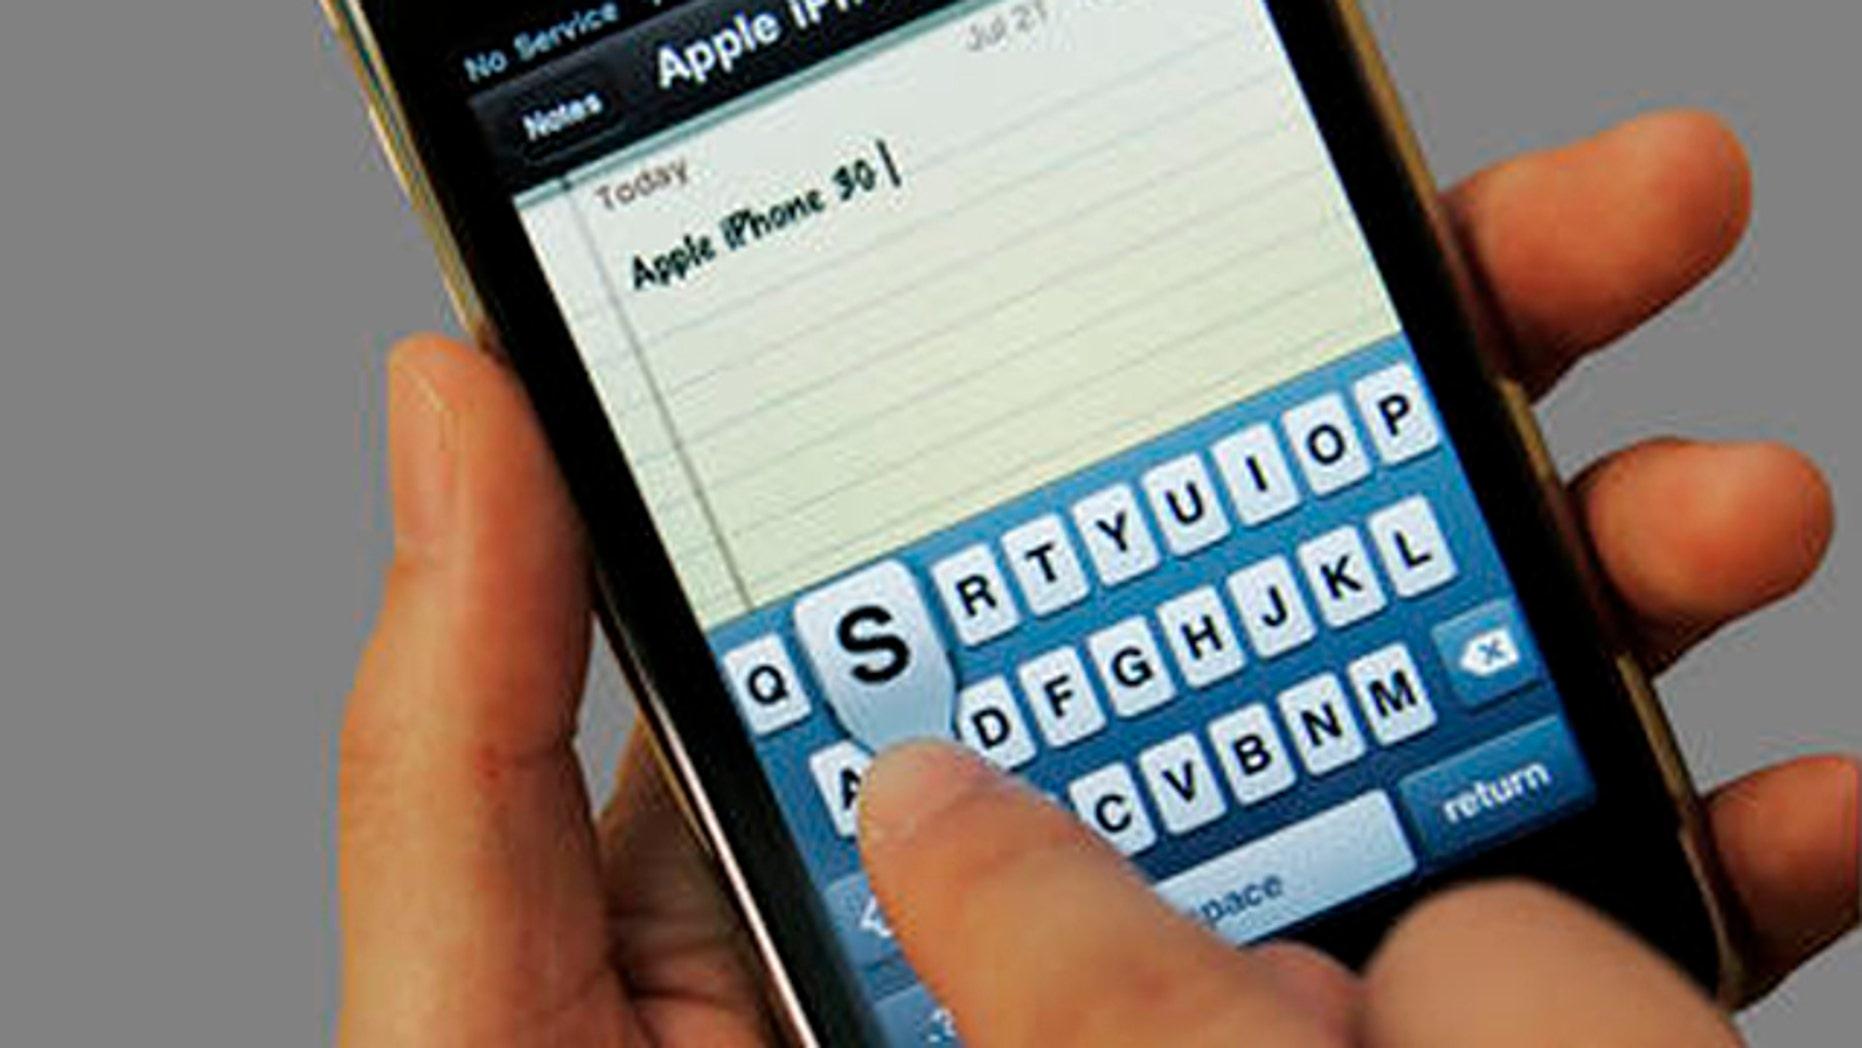 A customer uses an Apple iPhone 3GS at an Apple store in Palo Alto, Calif., Tuesday, July 21, 2009. (AP Photo/Paul Sakuma)